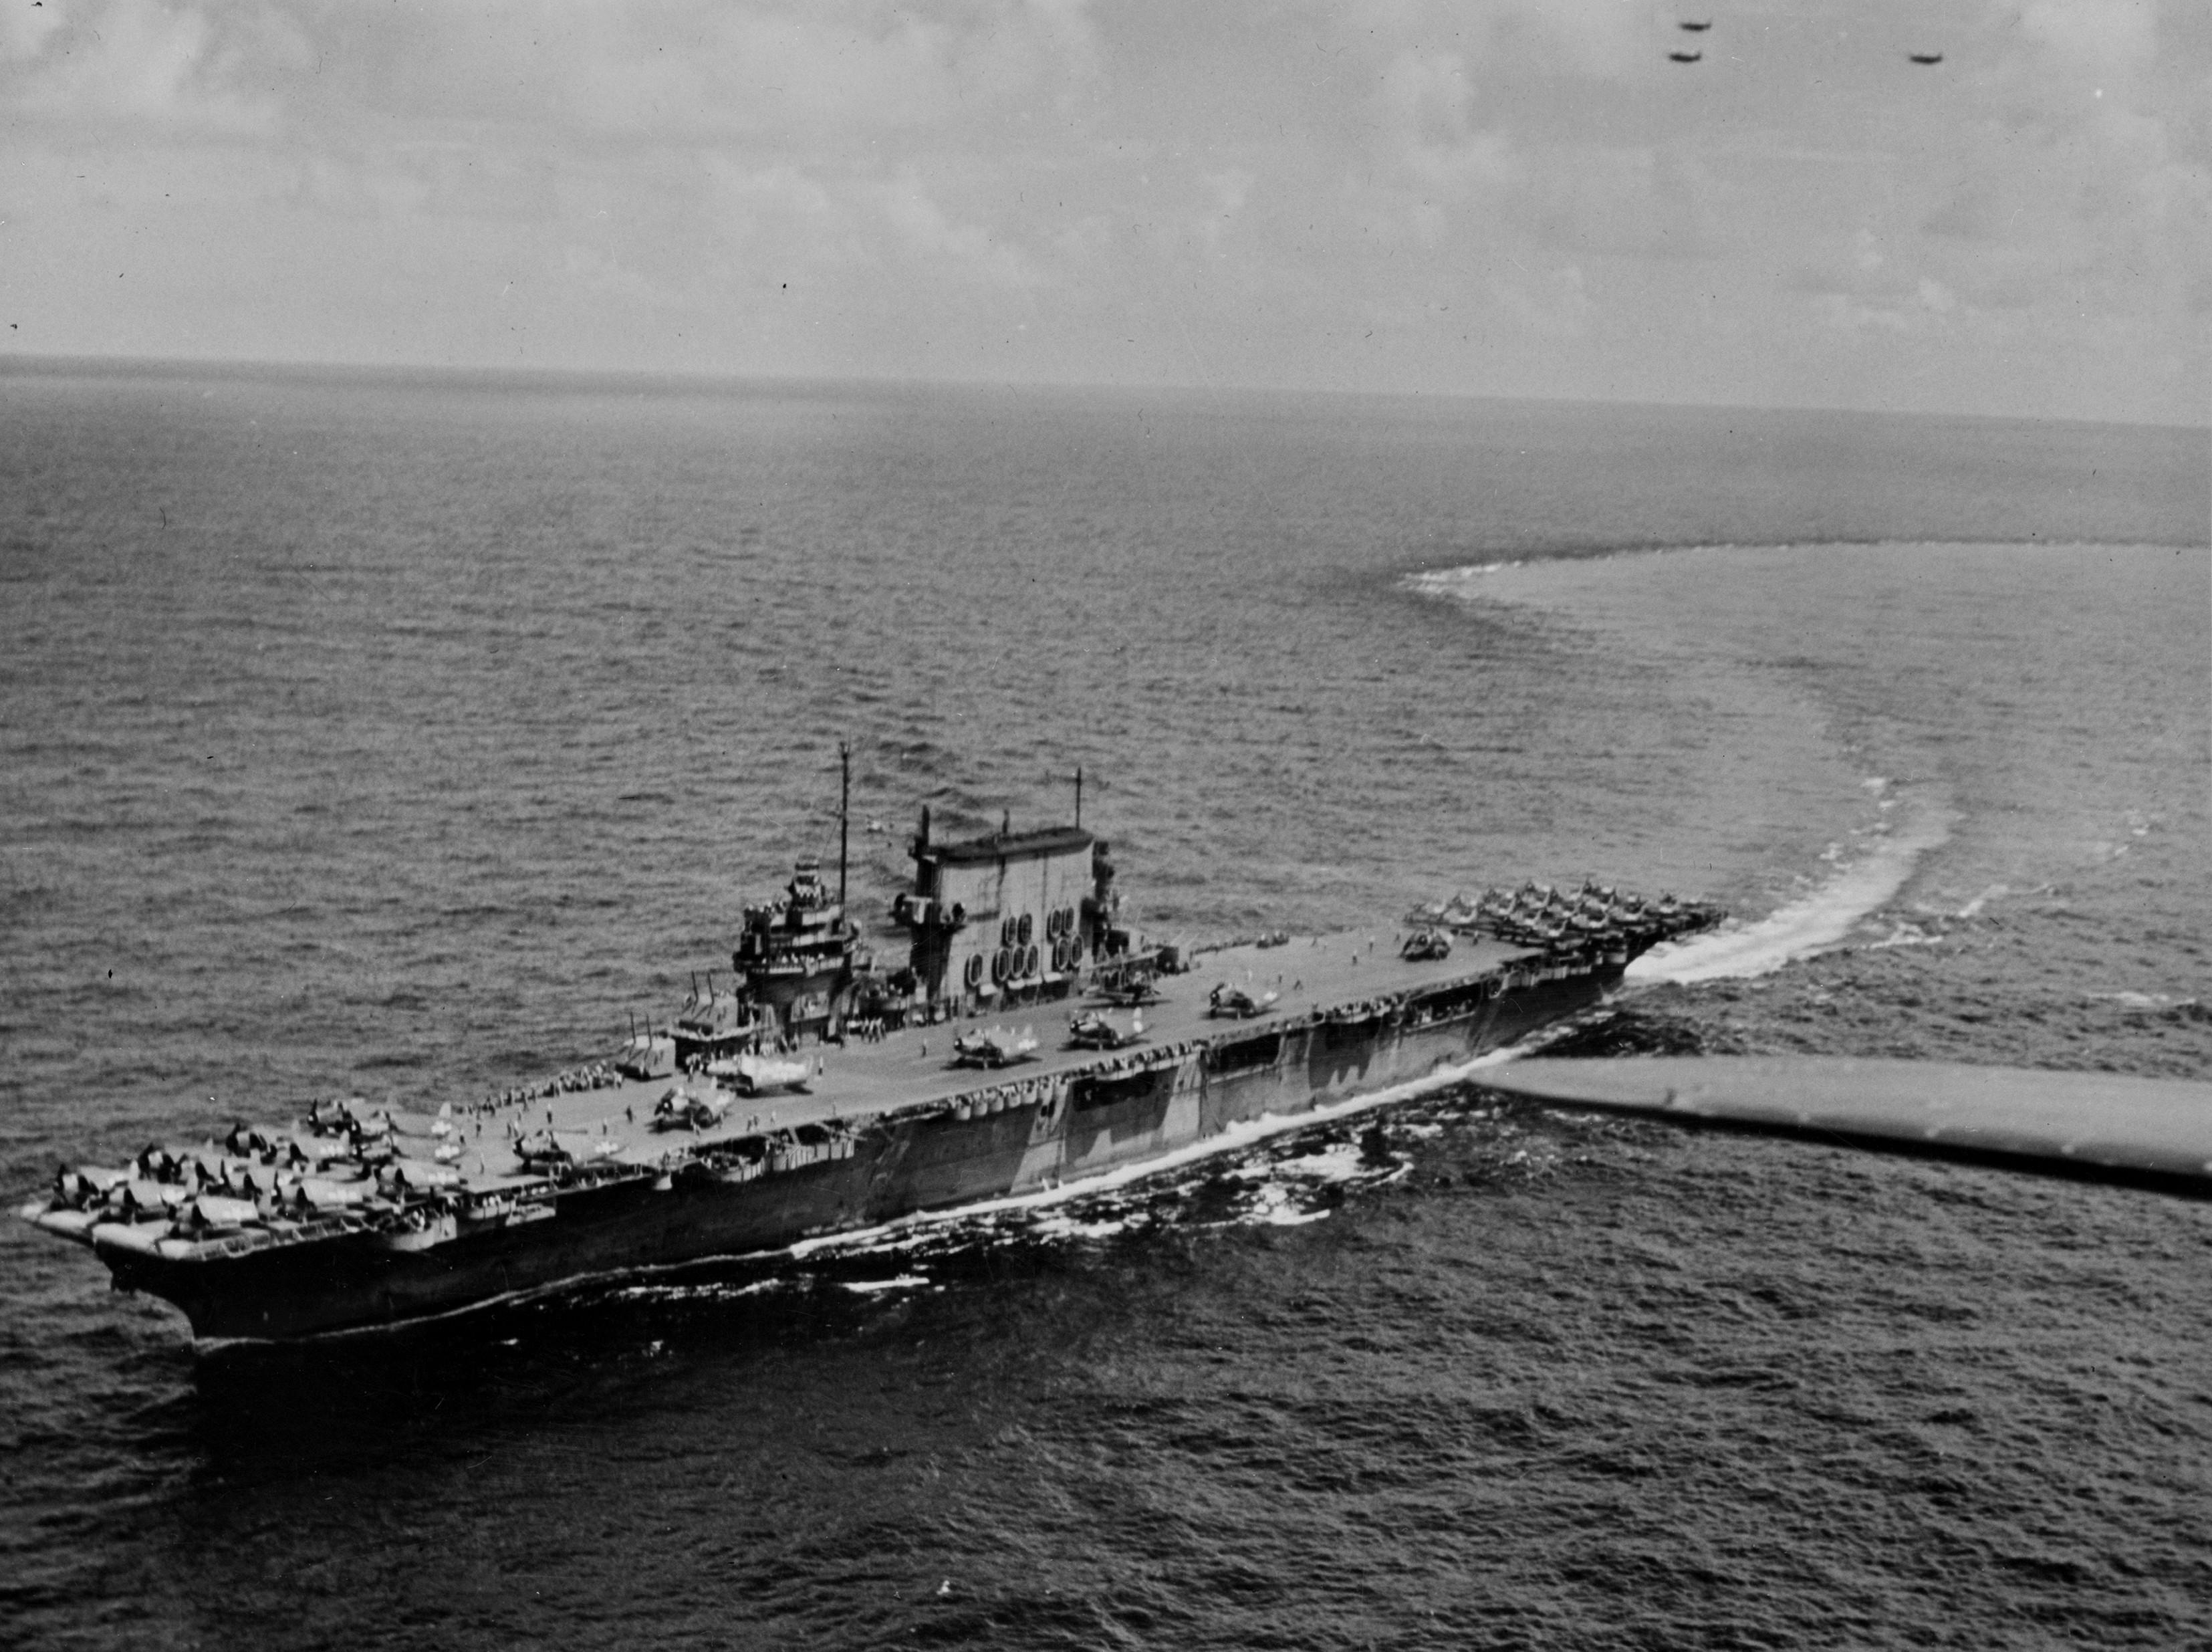 USS_Saratoga_(CV-3)_1943-44.jpg